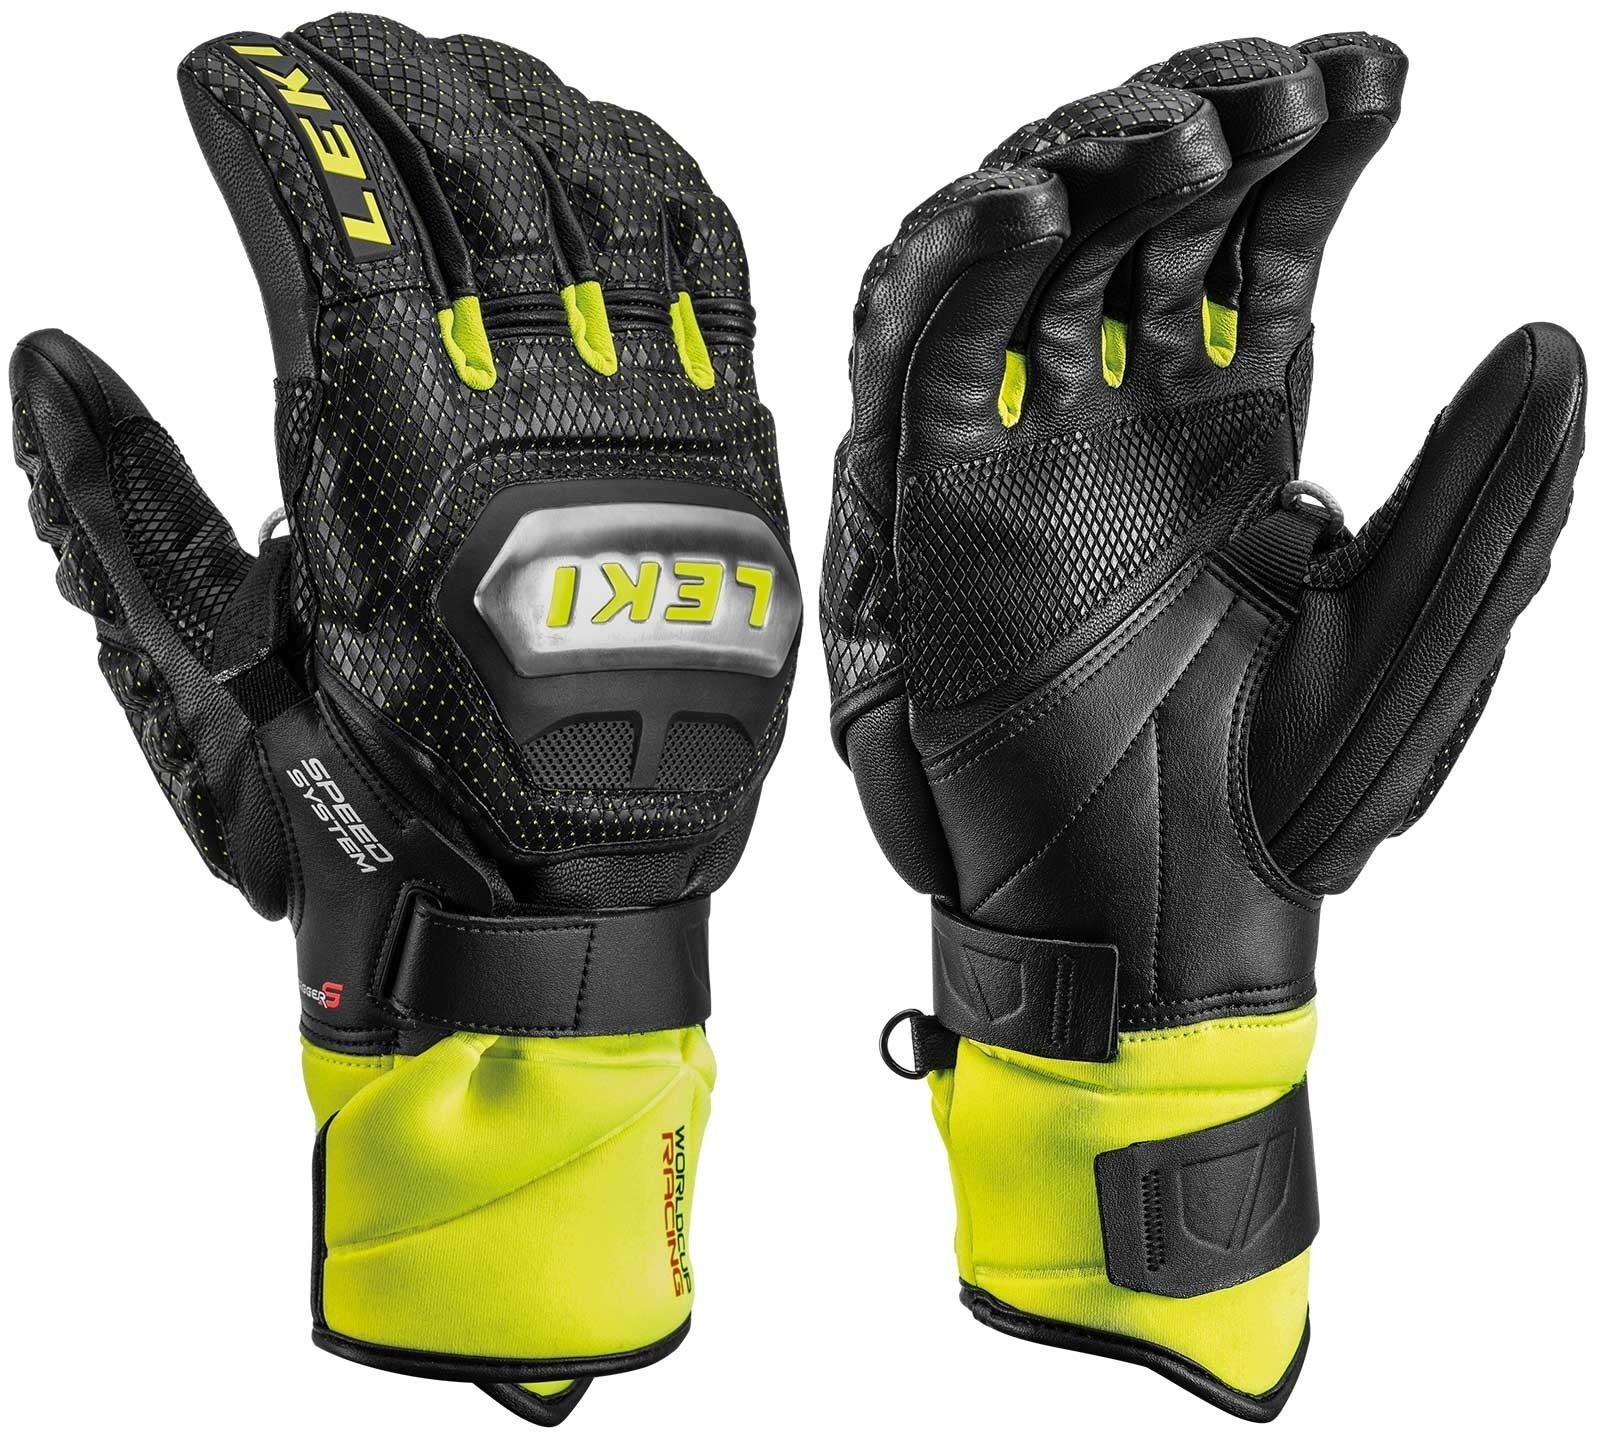 LEKI World Cup Racing Titanium S Speed System Gloves